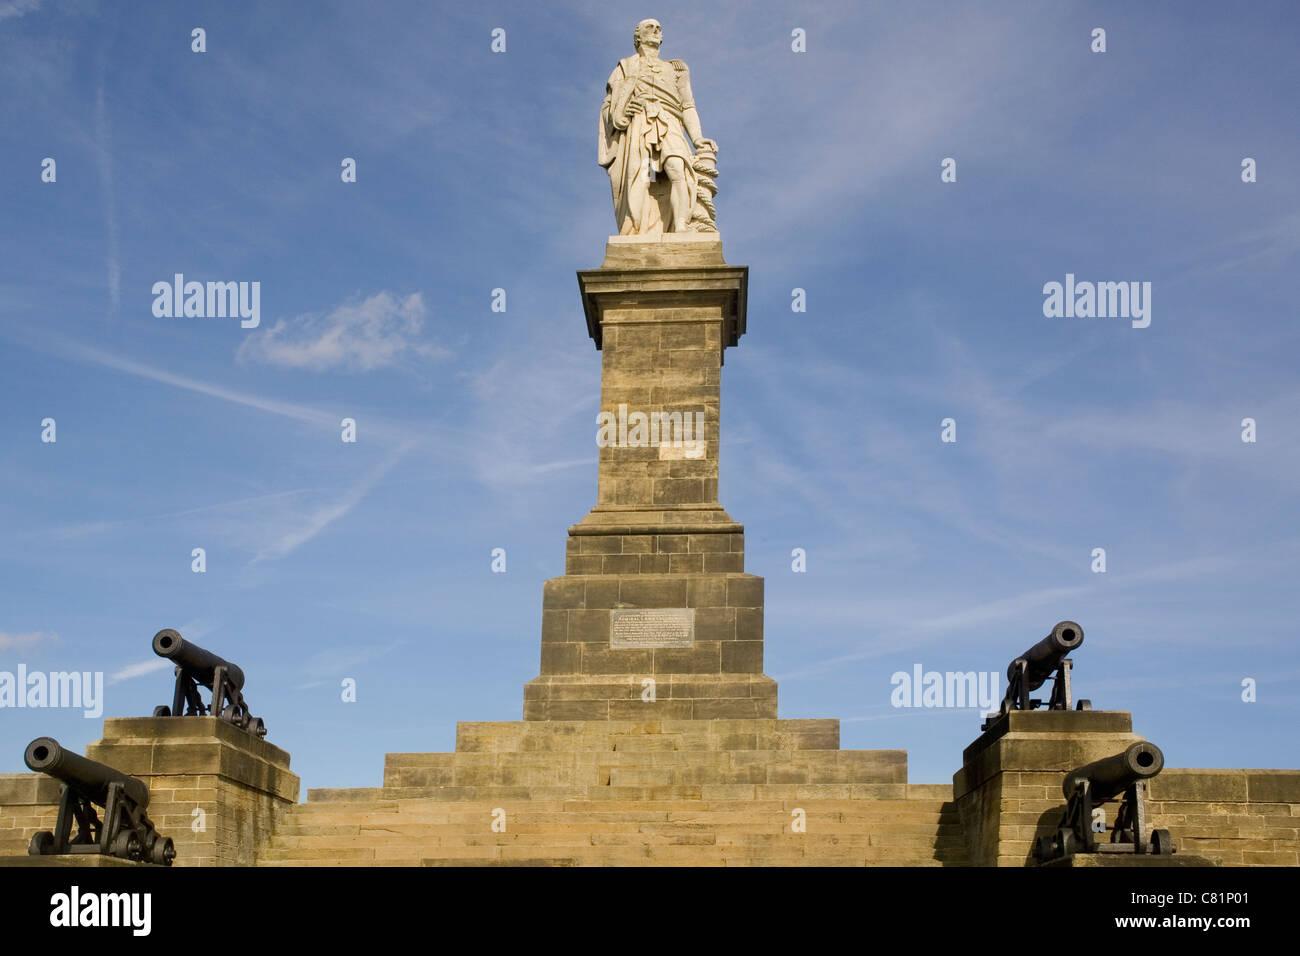 England Tyne&Wear Tynemouth Collingwood monument Stock Photo